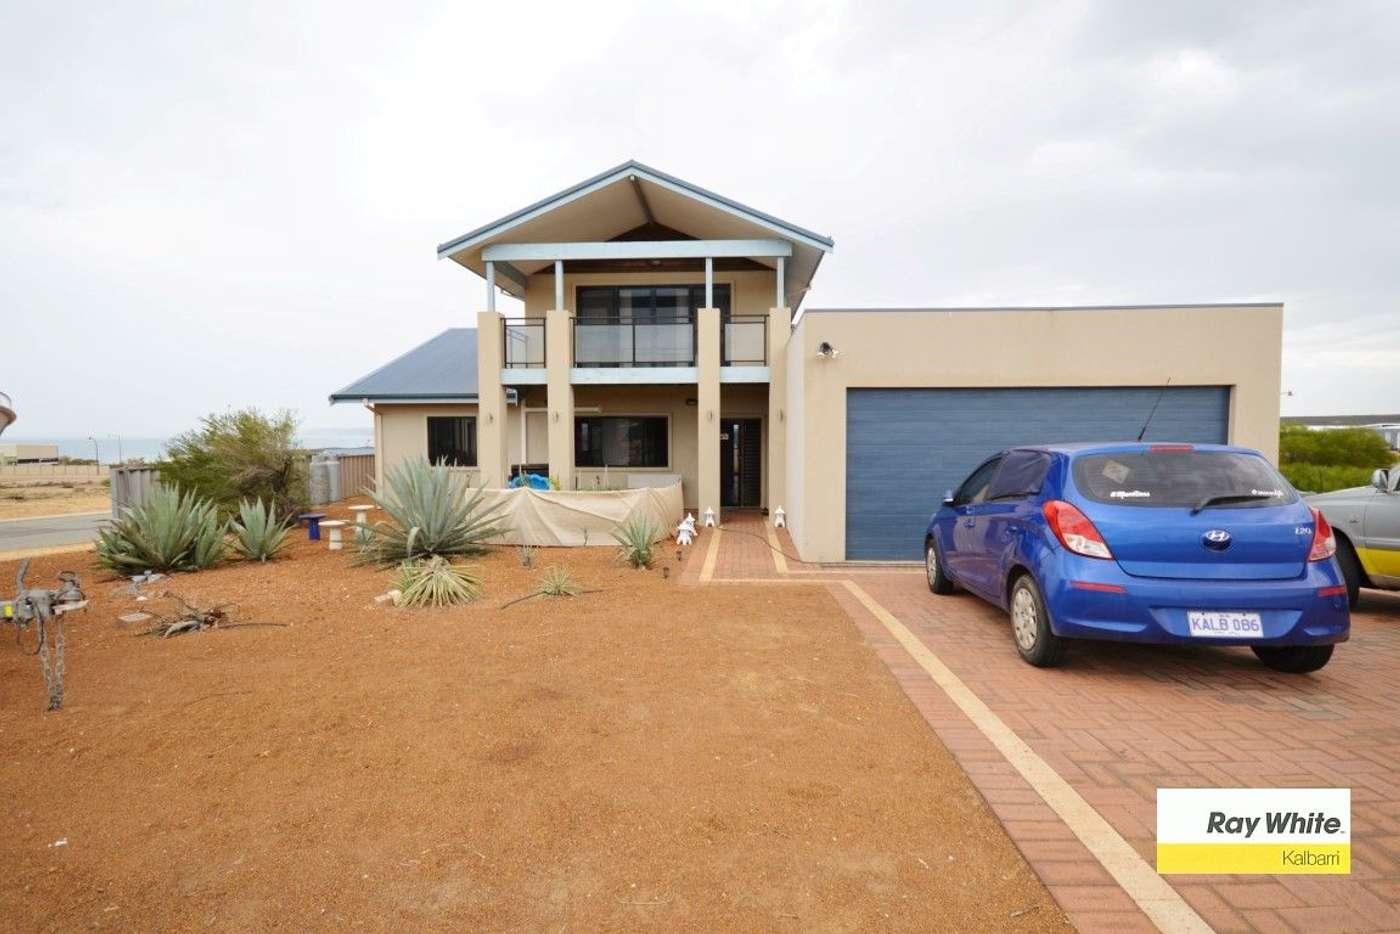 Main view of Homely house listing, 20 Waitzia Way, Kalbarri WA 6536